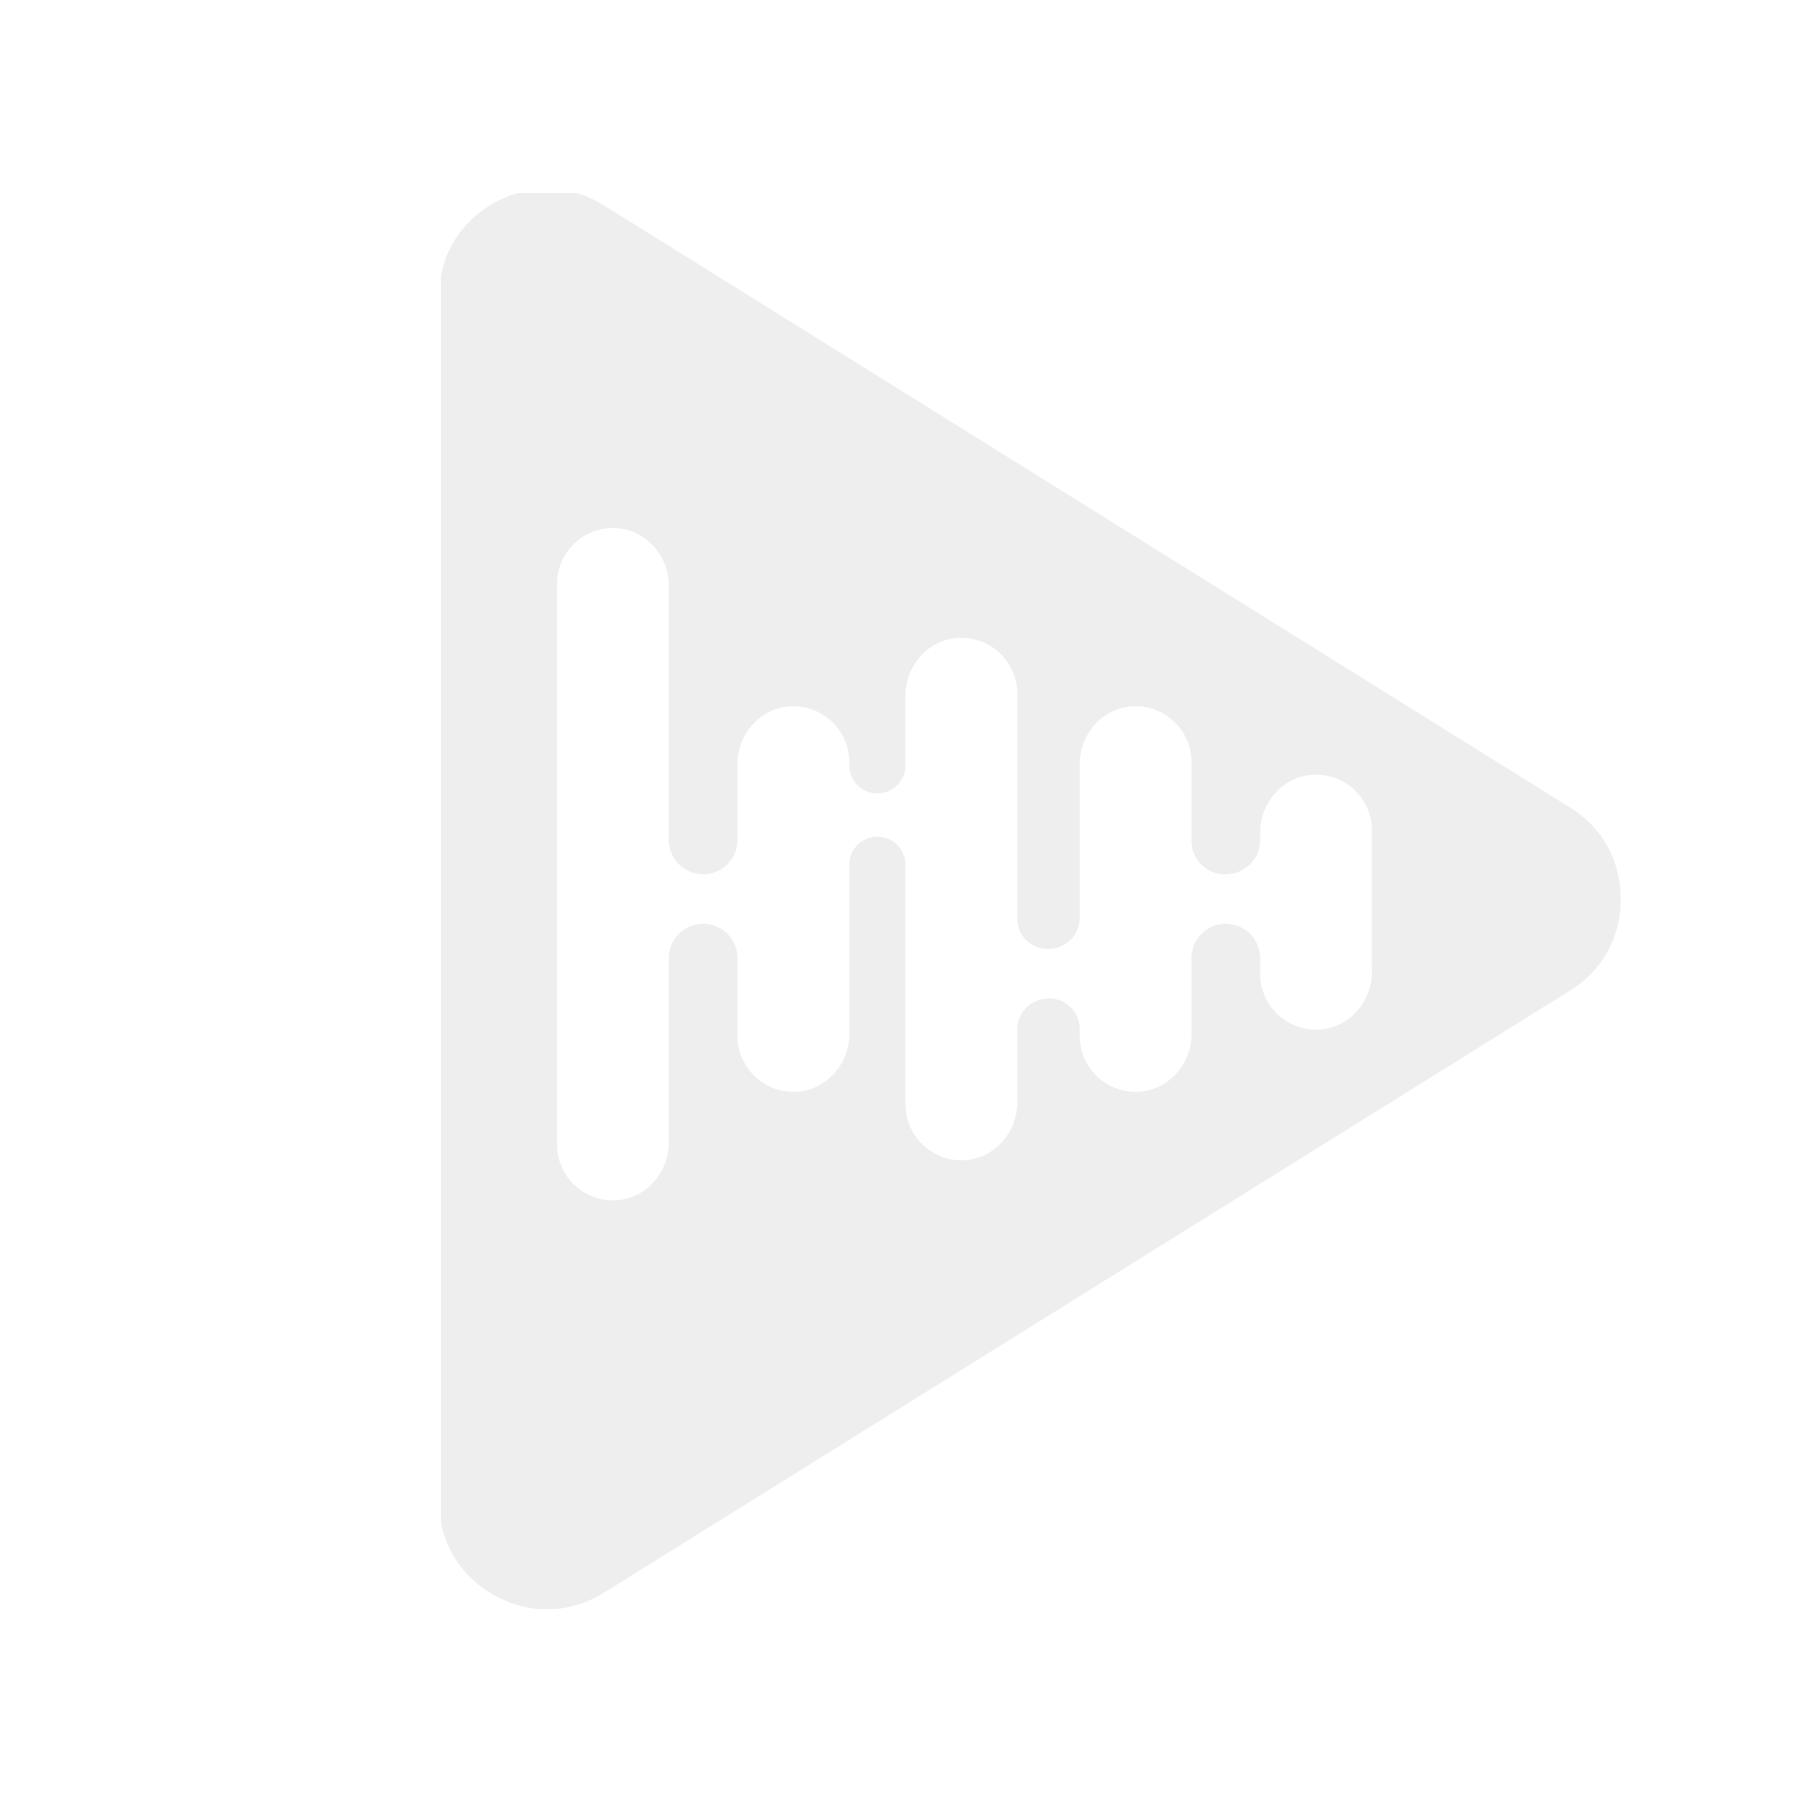 PSB Imagine Mini PWB-1 - Veggfeste for Imagine Mini (Par)